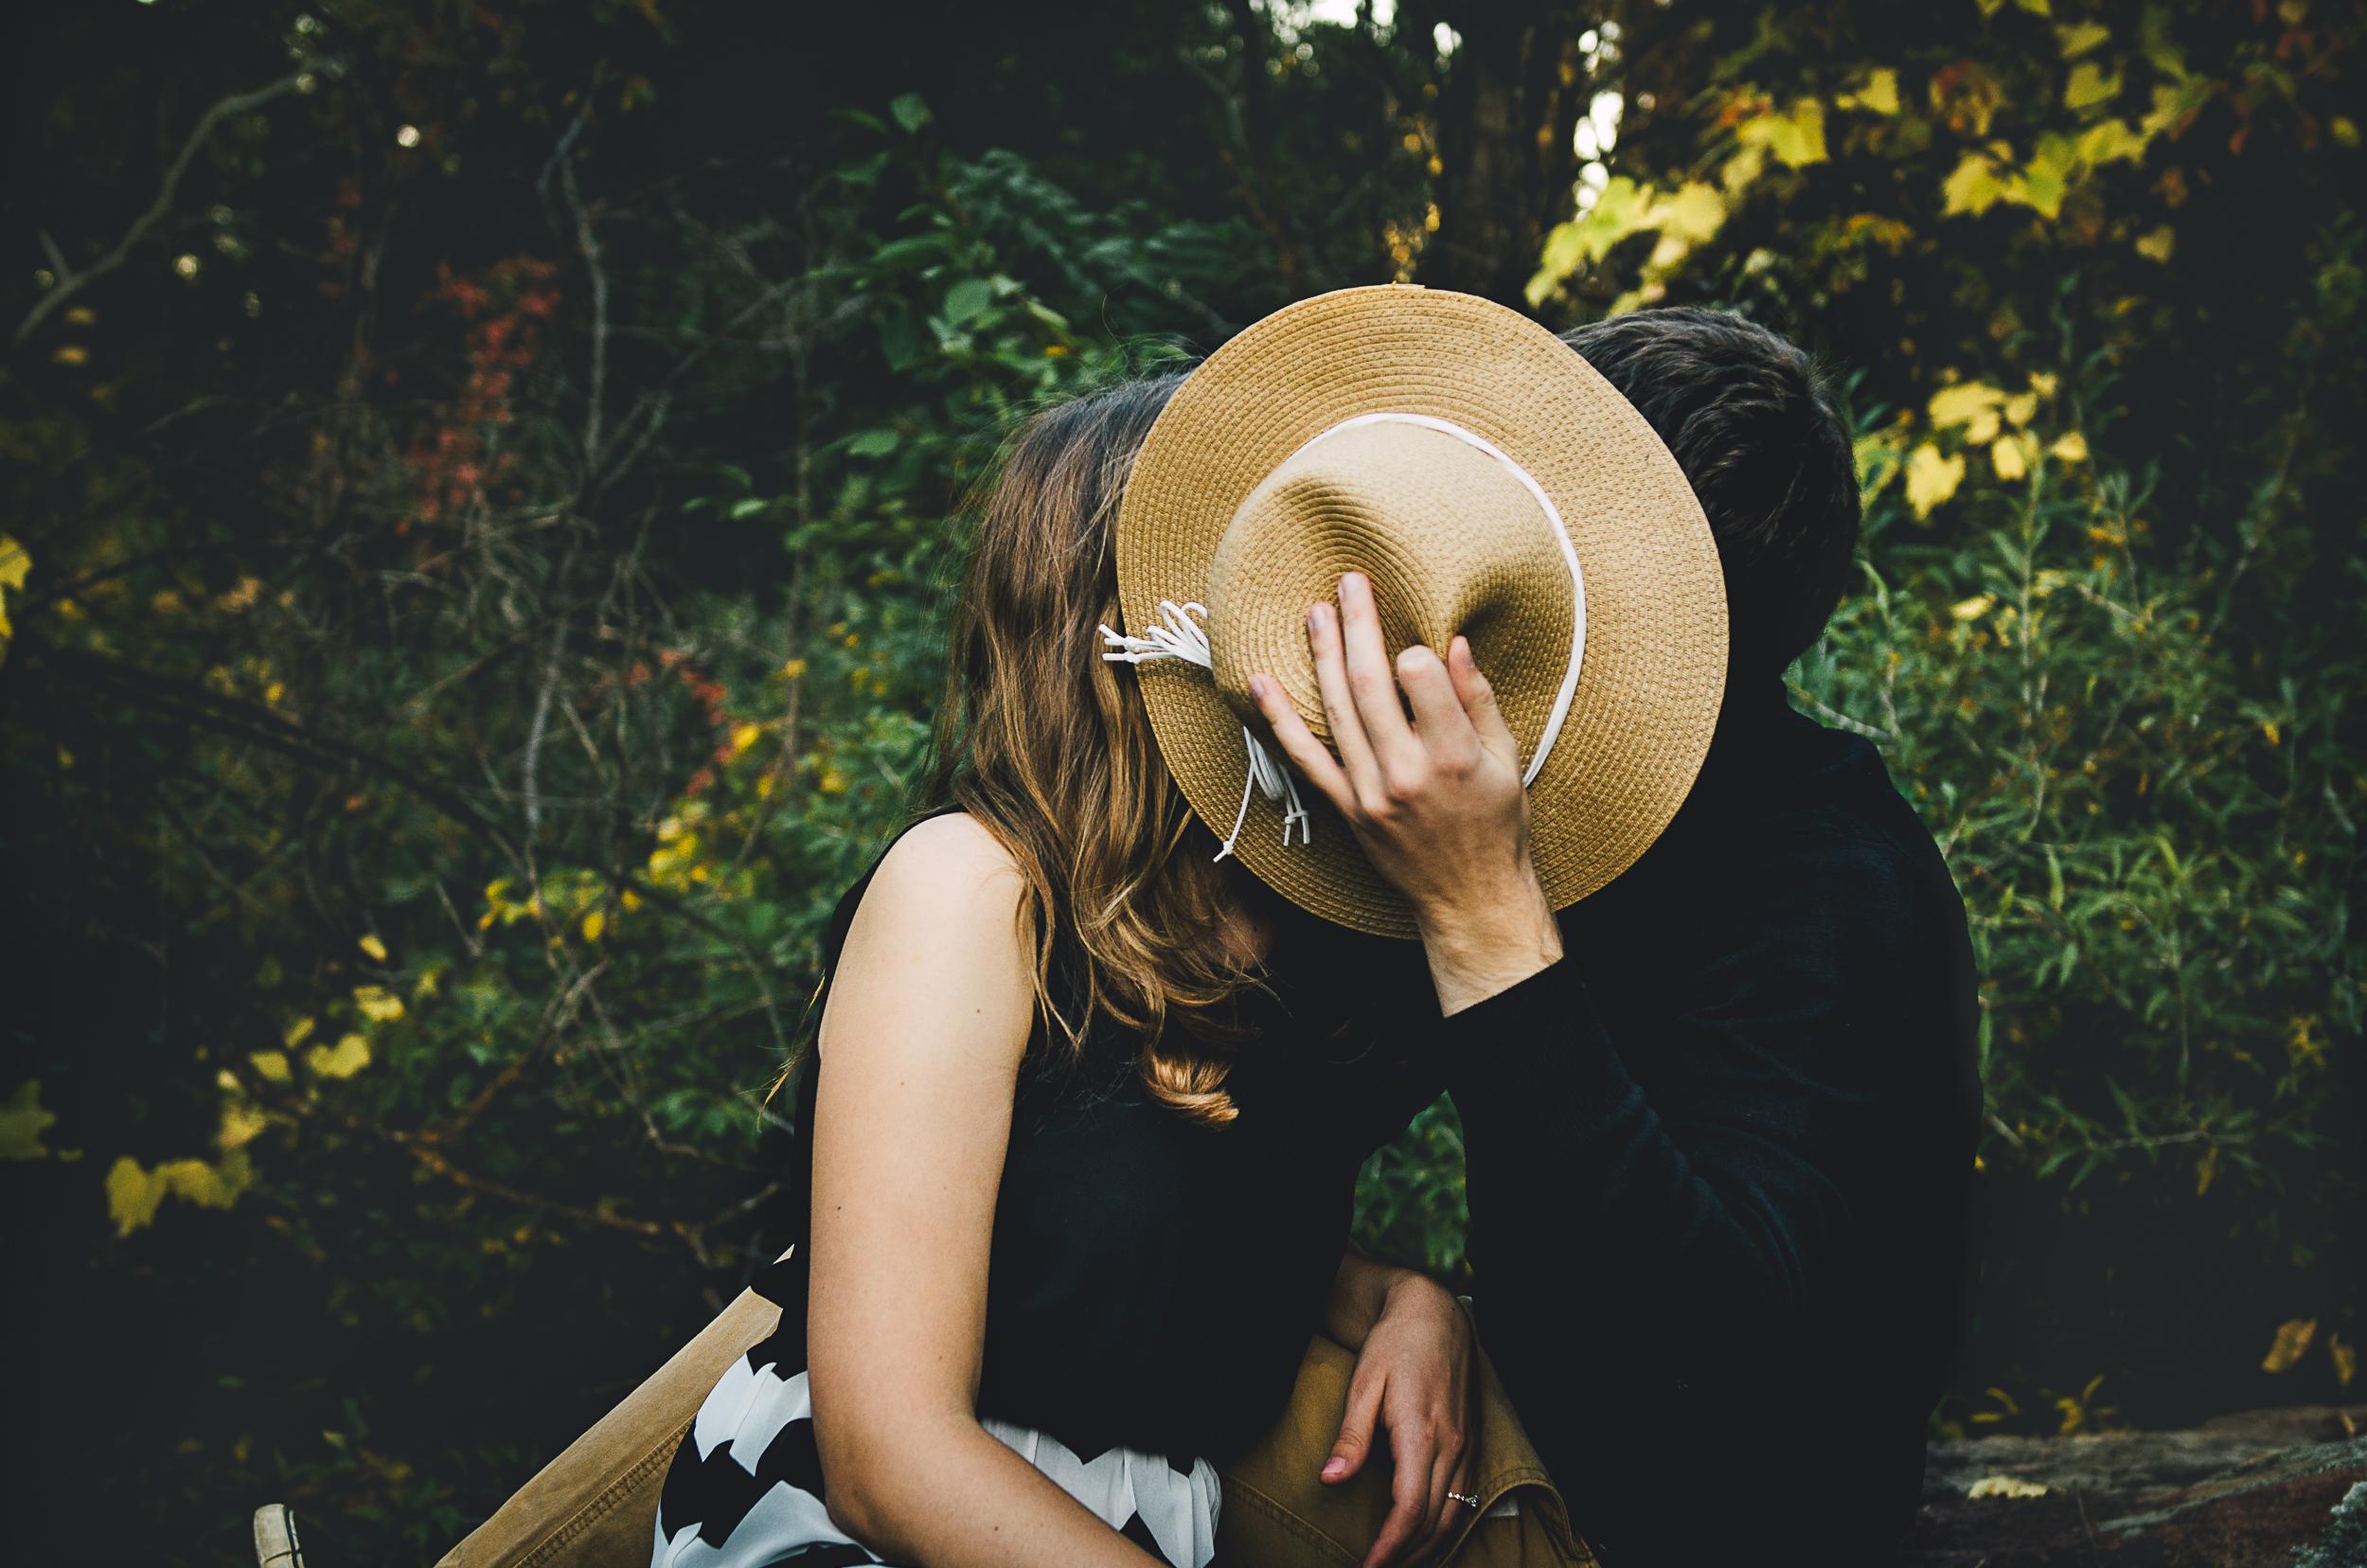 Amy&Jake-Engagements-JPEGS-0898.jpg